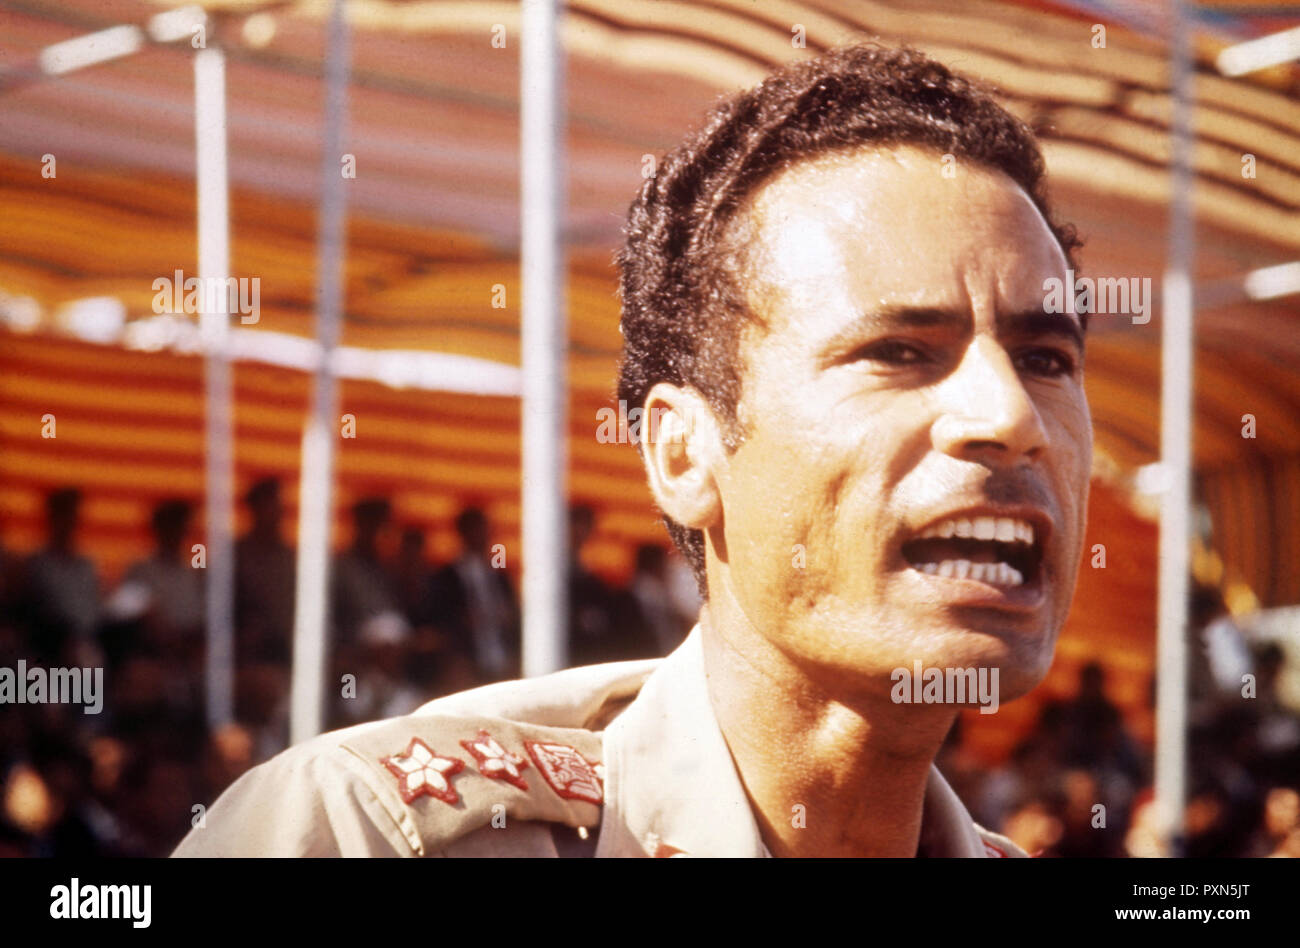 muammar gaddafi, 70s - Stock Image